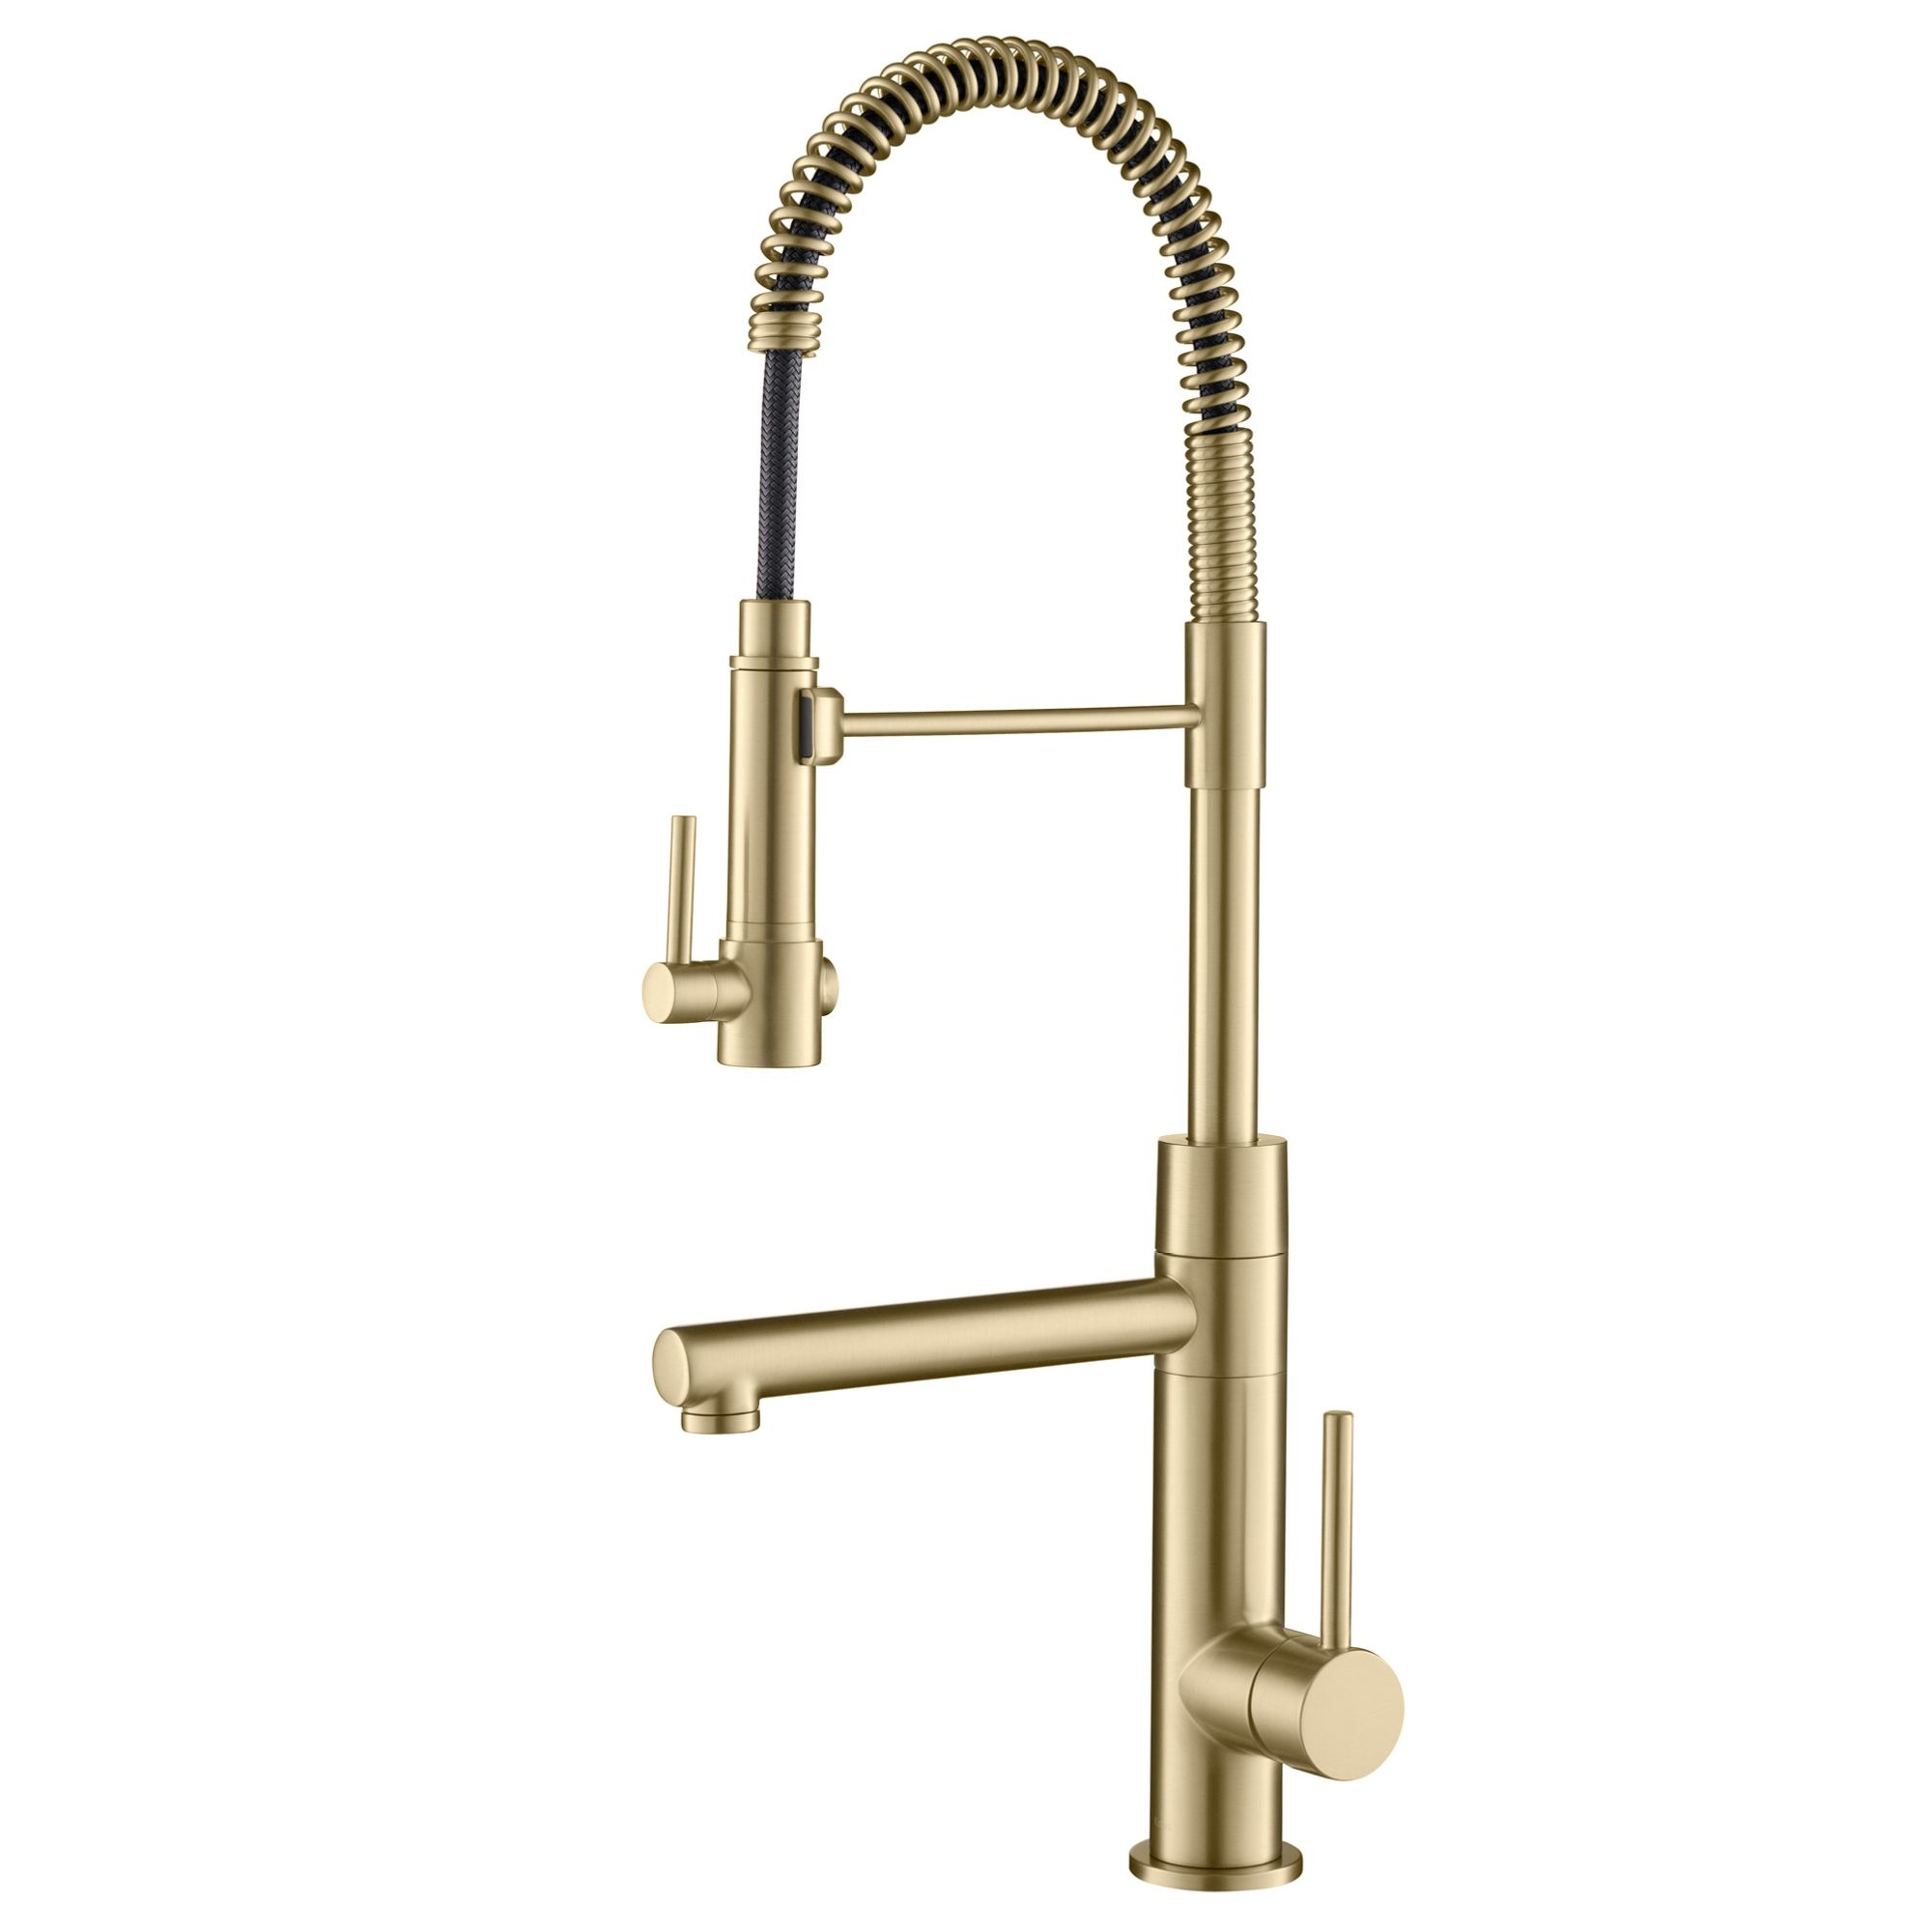 Dual Handles Pot Filler Folding tap Brass Kitchen Sink Faucet Brushed gold Tap